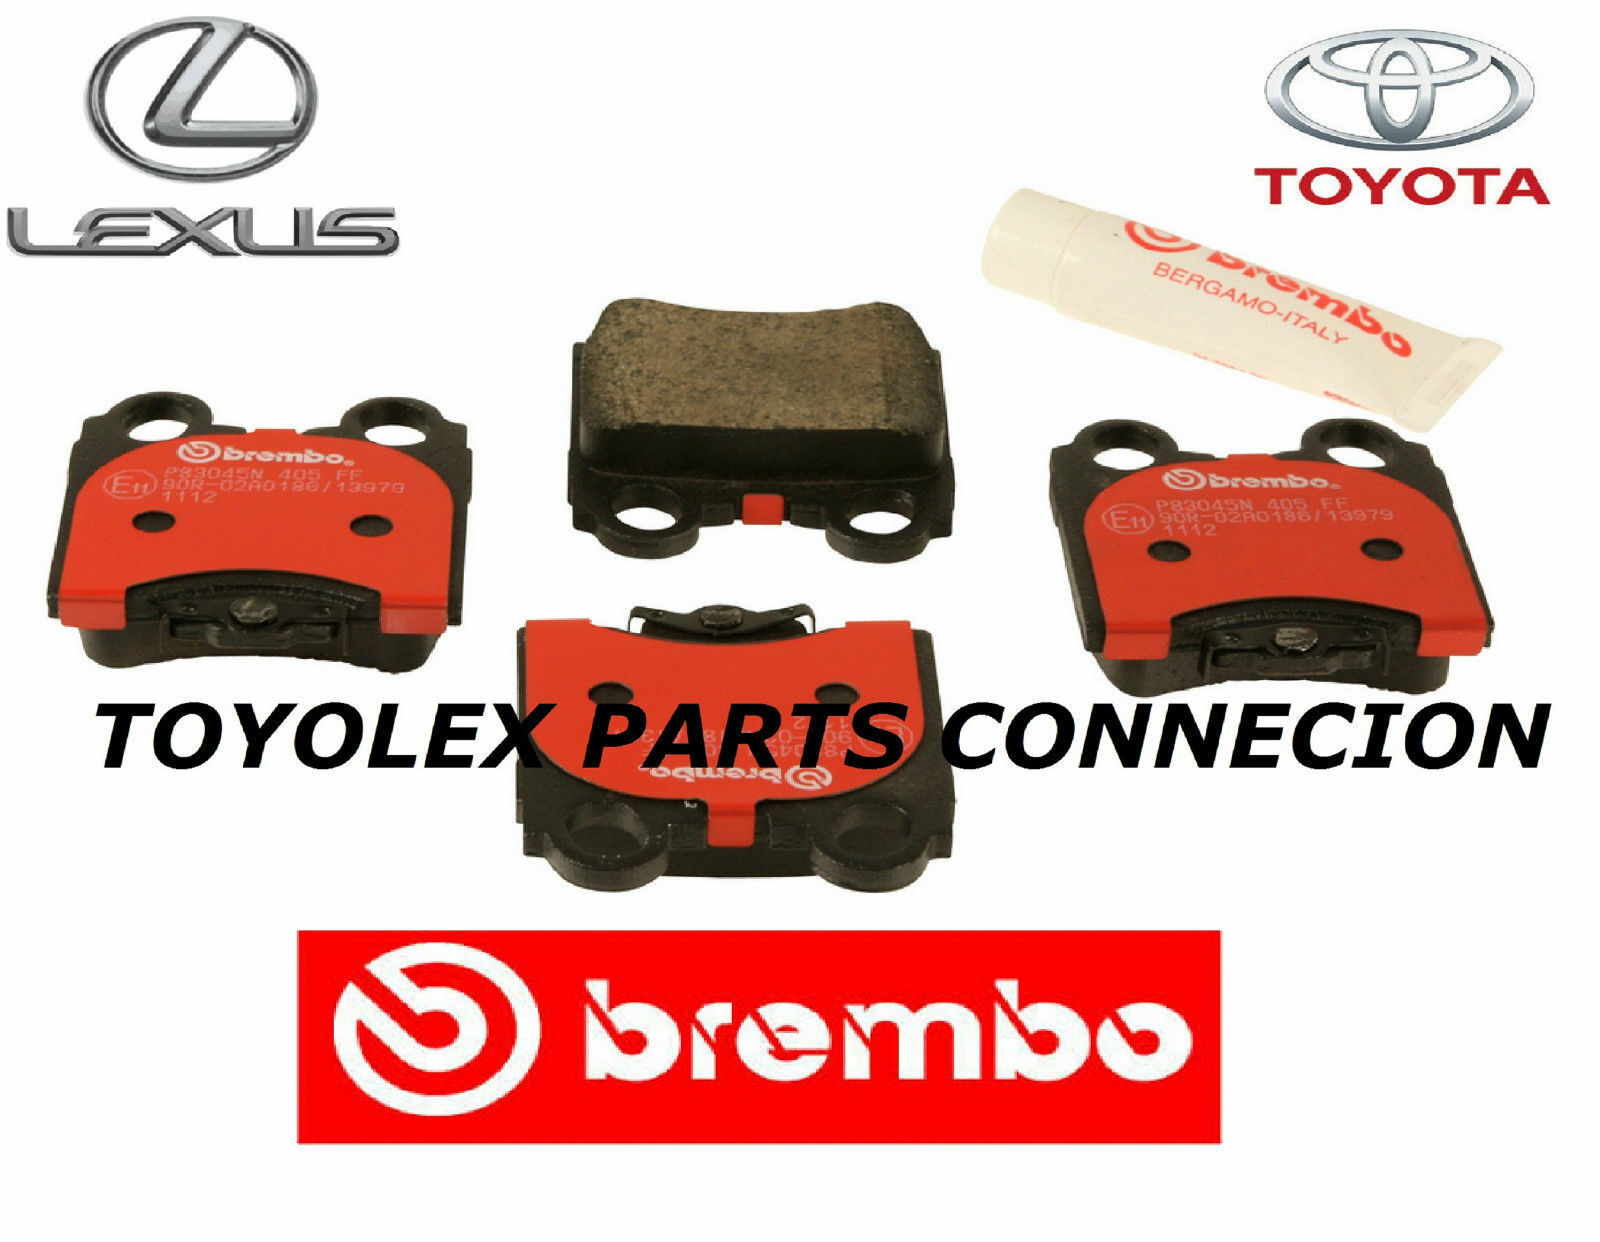 Lexus Rear Factory OEM Spec Brembo Brake Pads & Shims Kit